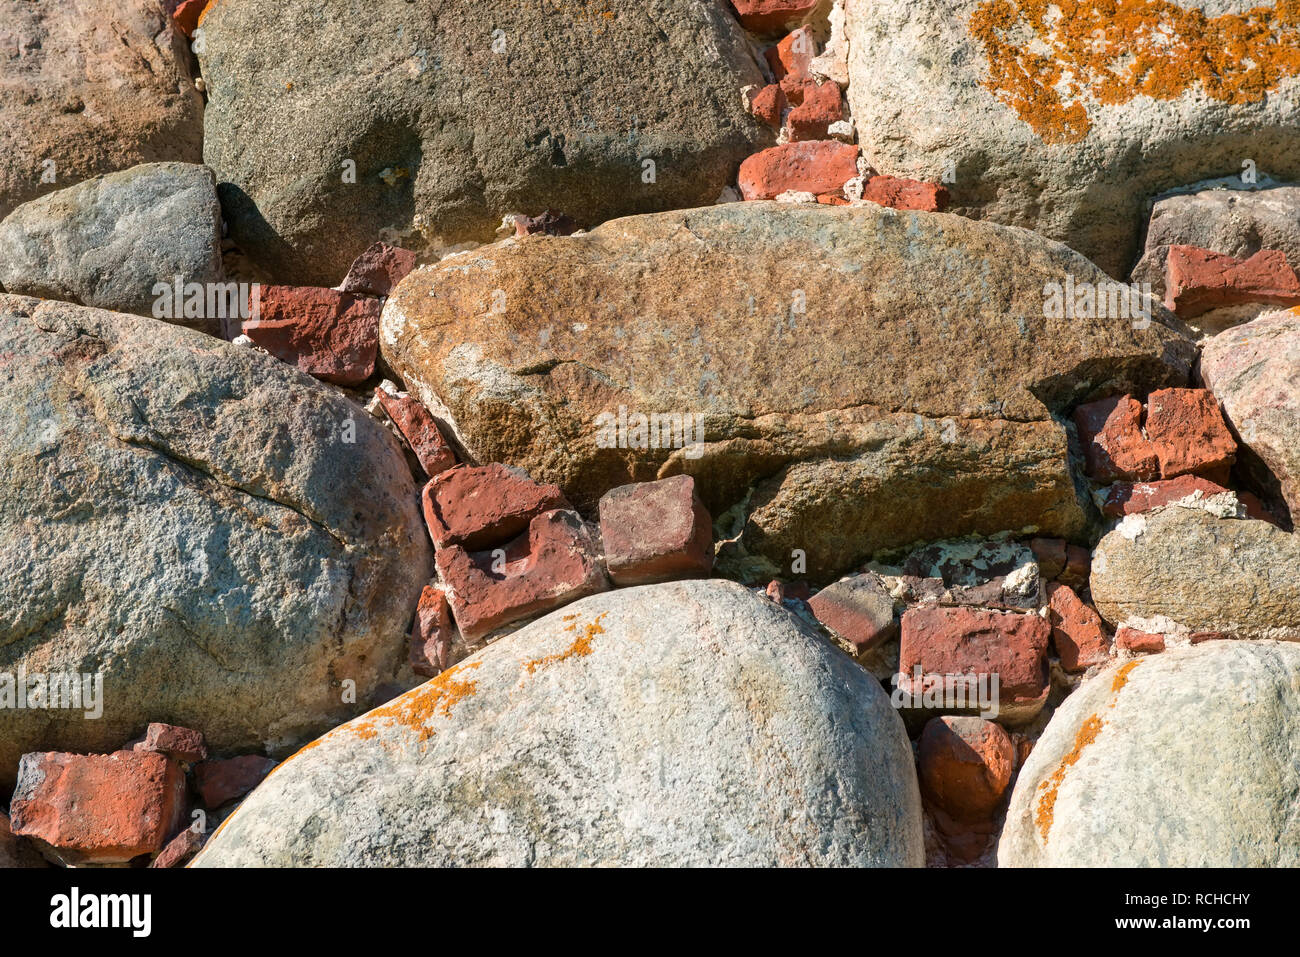 Part of the wall of the Spaso-Preobrazhensky Solovetsky Monastery. Solovetsky archipelago, White Sea, Russia Stock Photo